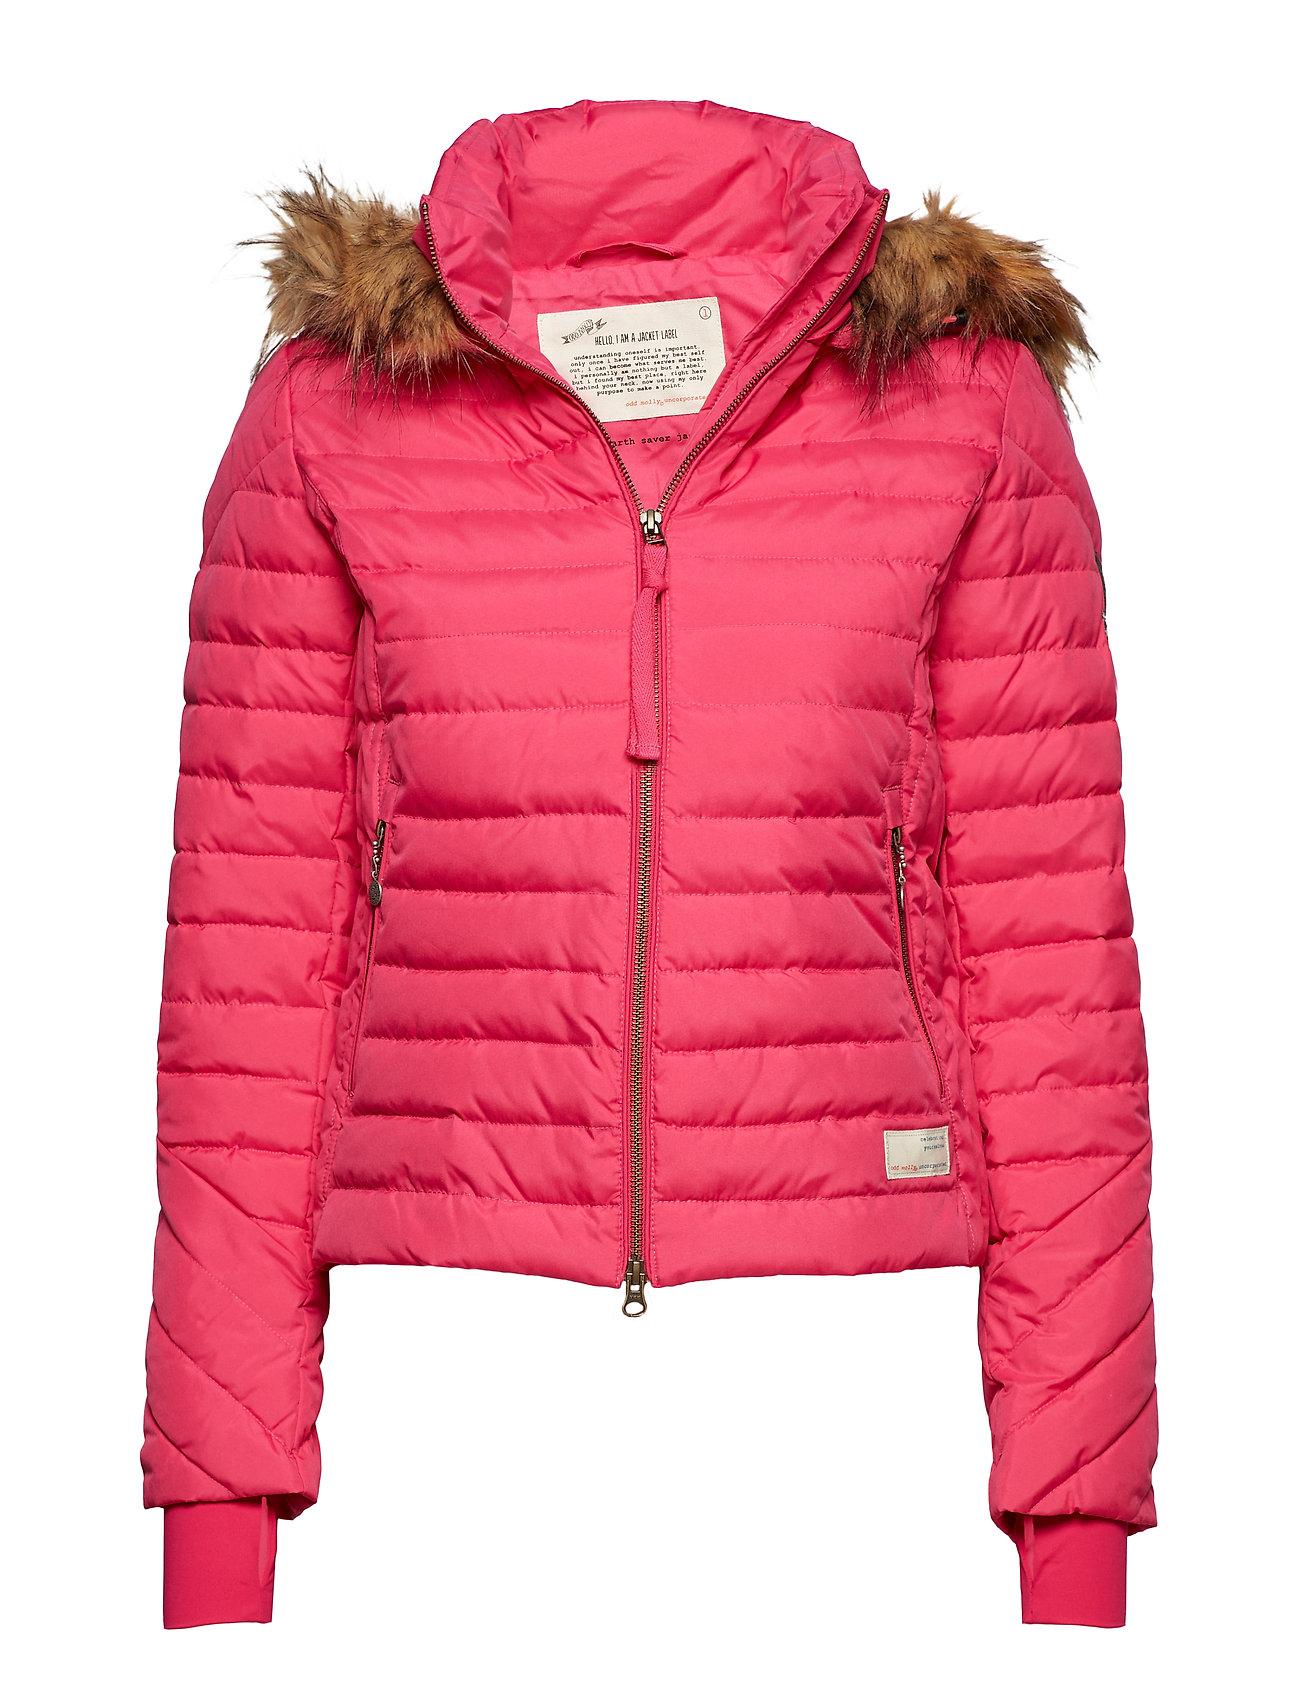 ODD MOLLY ACTIVE WEAR earth saver jacket - HOT PINK